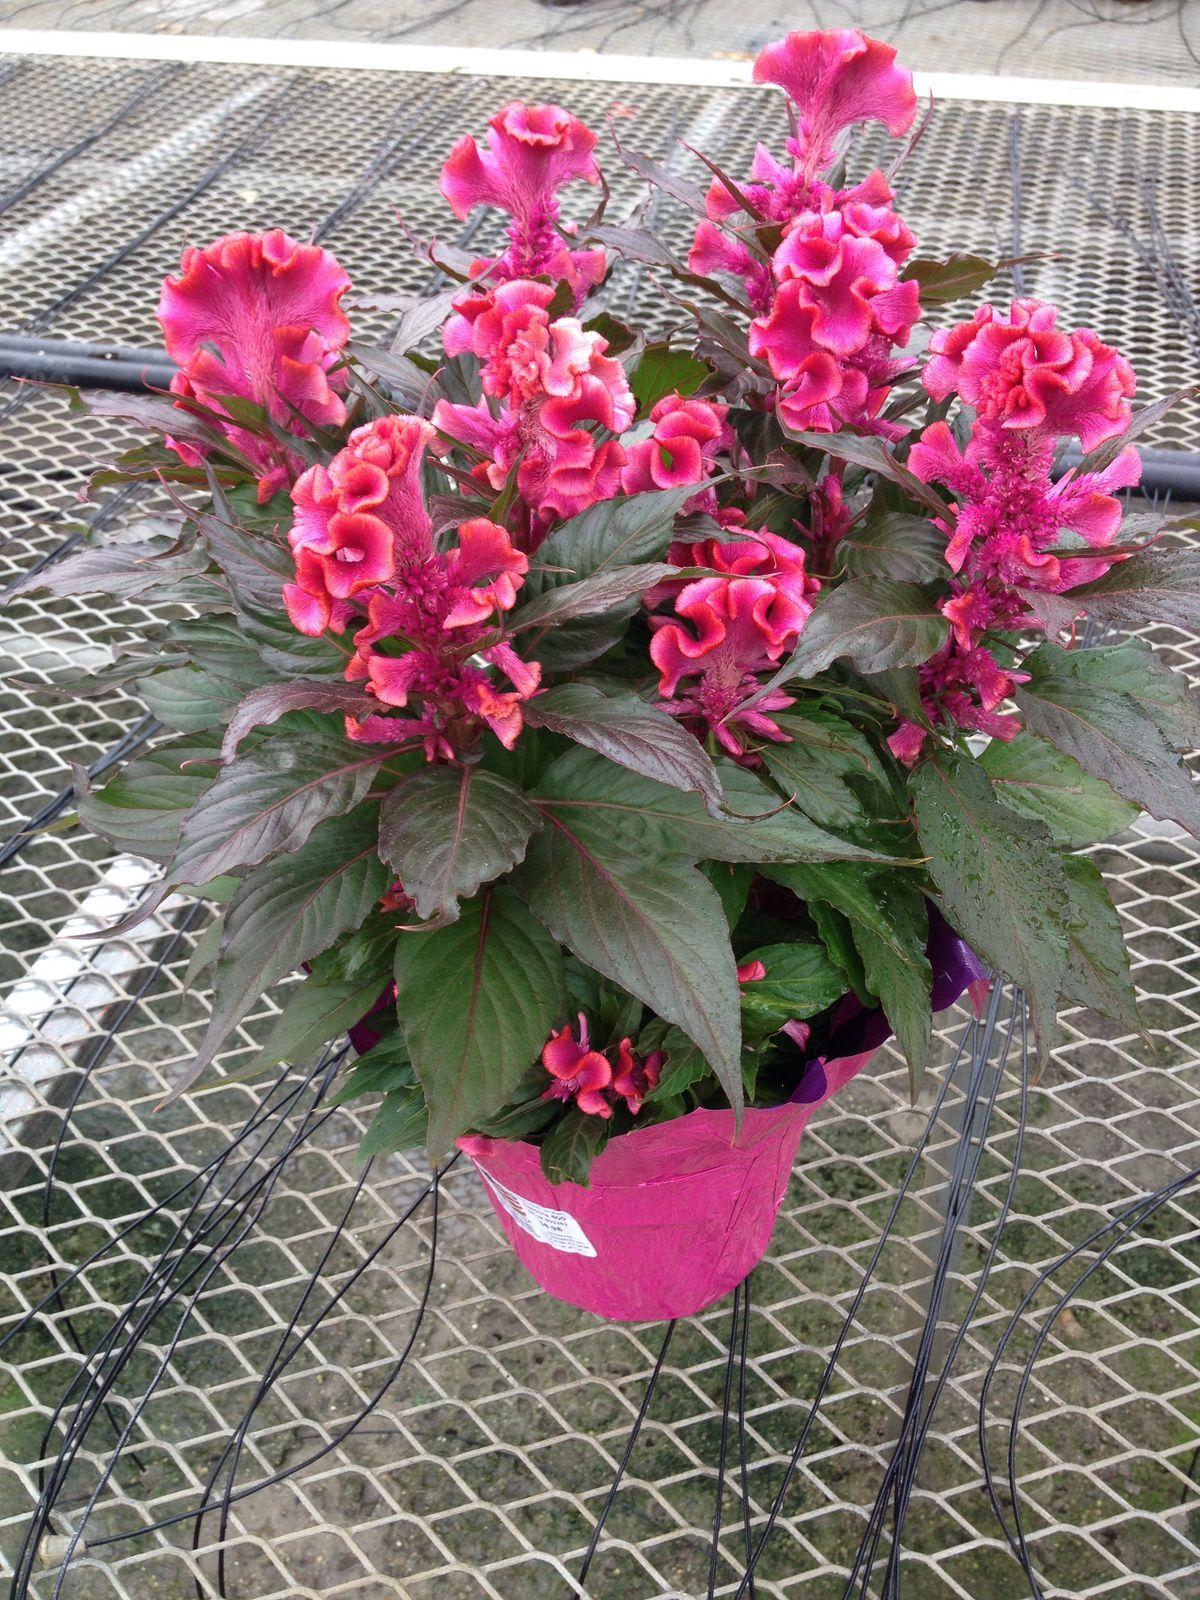 Super 6.0 Celosia - Hot Topic Pink | Celosia @ White's Nursery | Garden UJ98